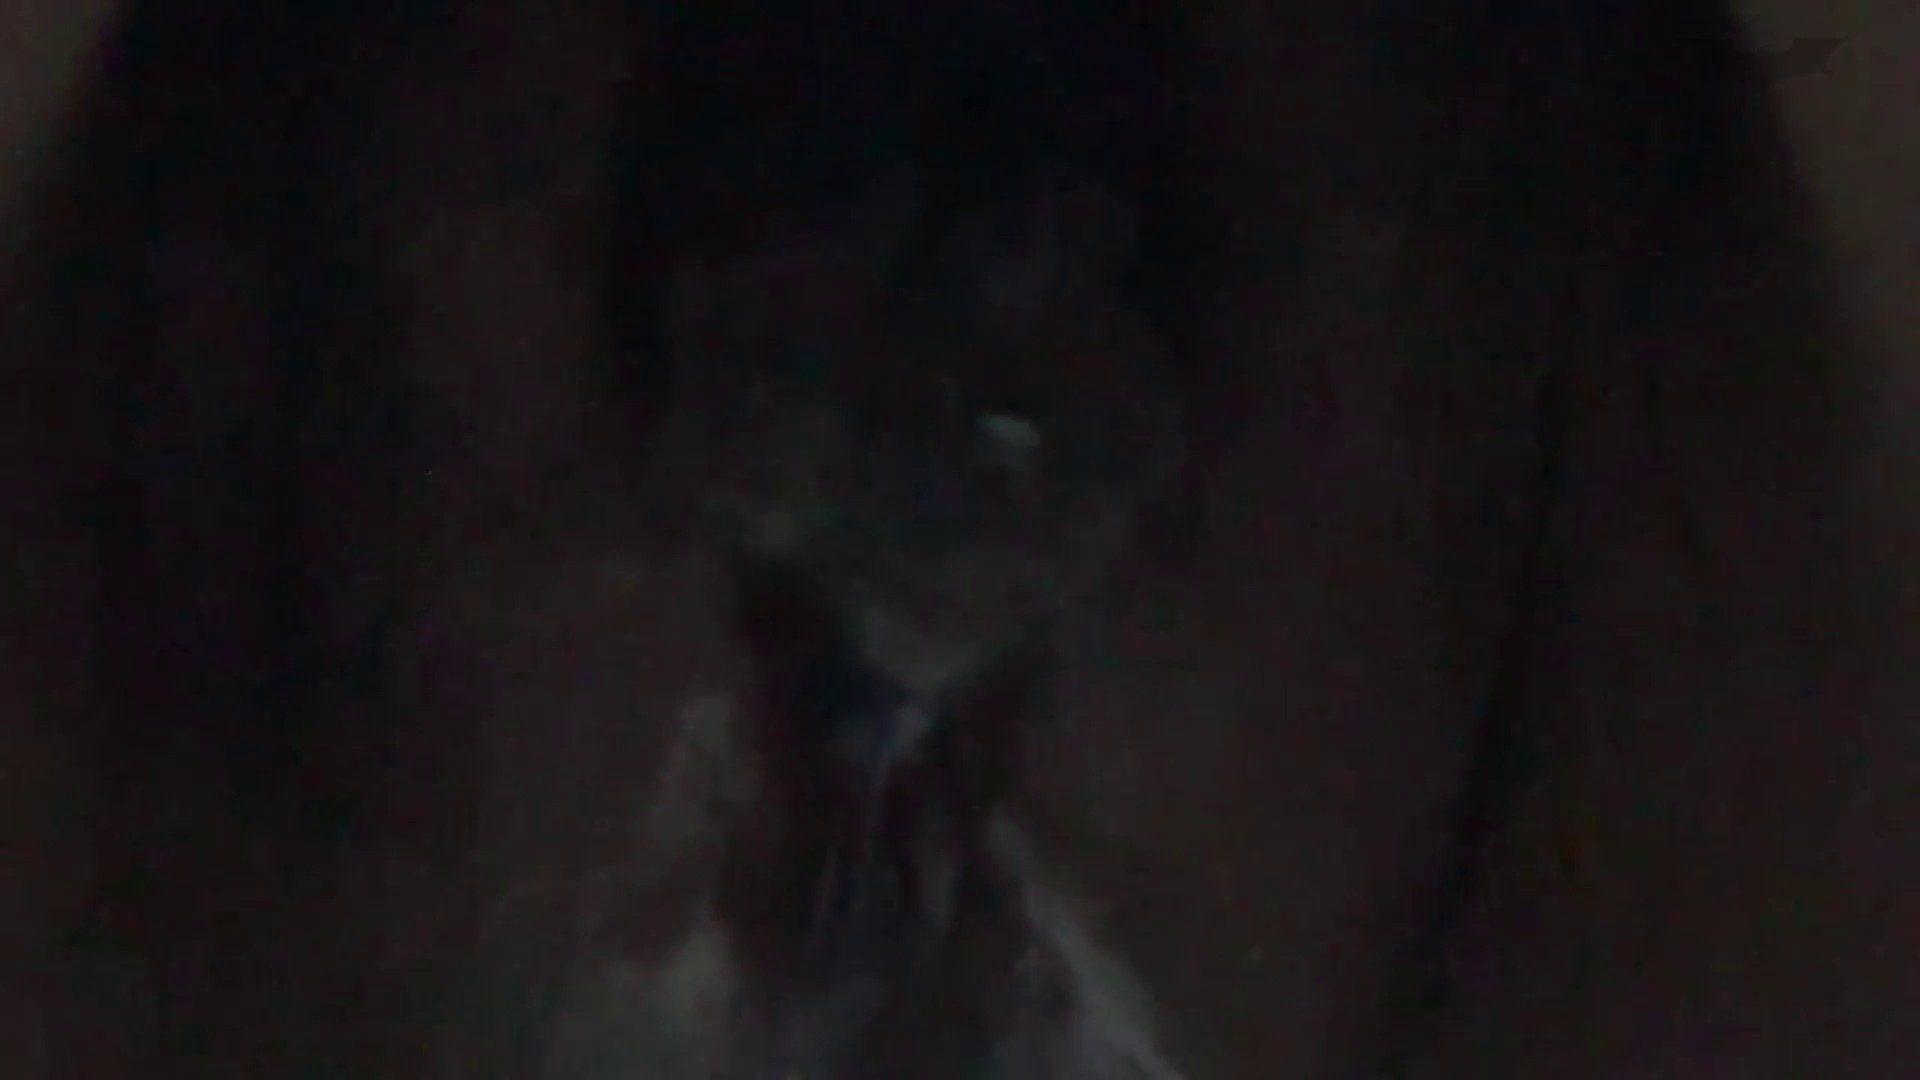 JD盗撮 美女の洗面所の秘密 Vol.41 ギャル攻め  67画像 55